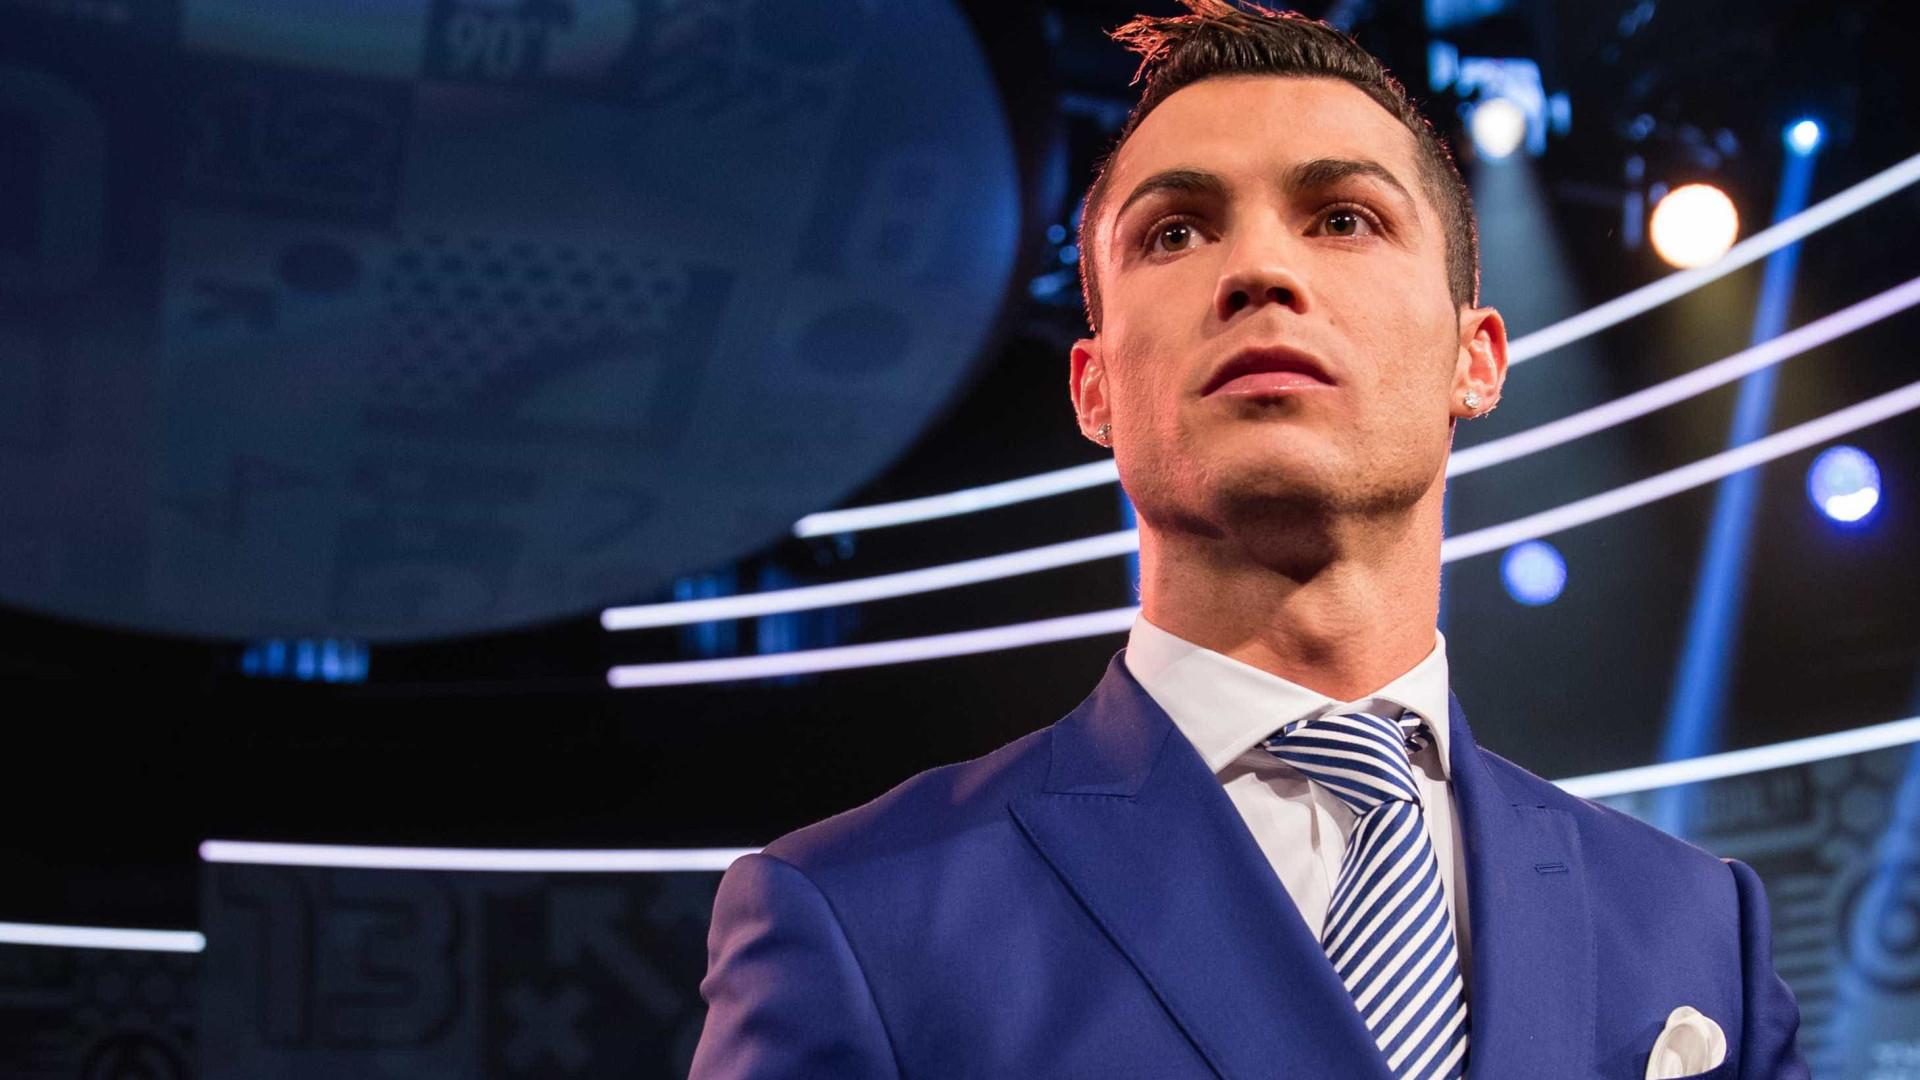 Georgina Rodríguez volta a declarar-se a Ronaldo